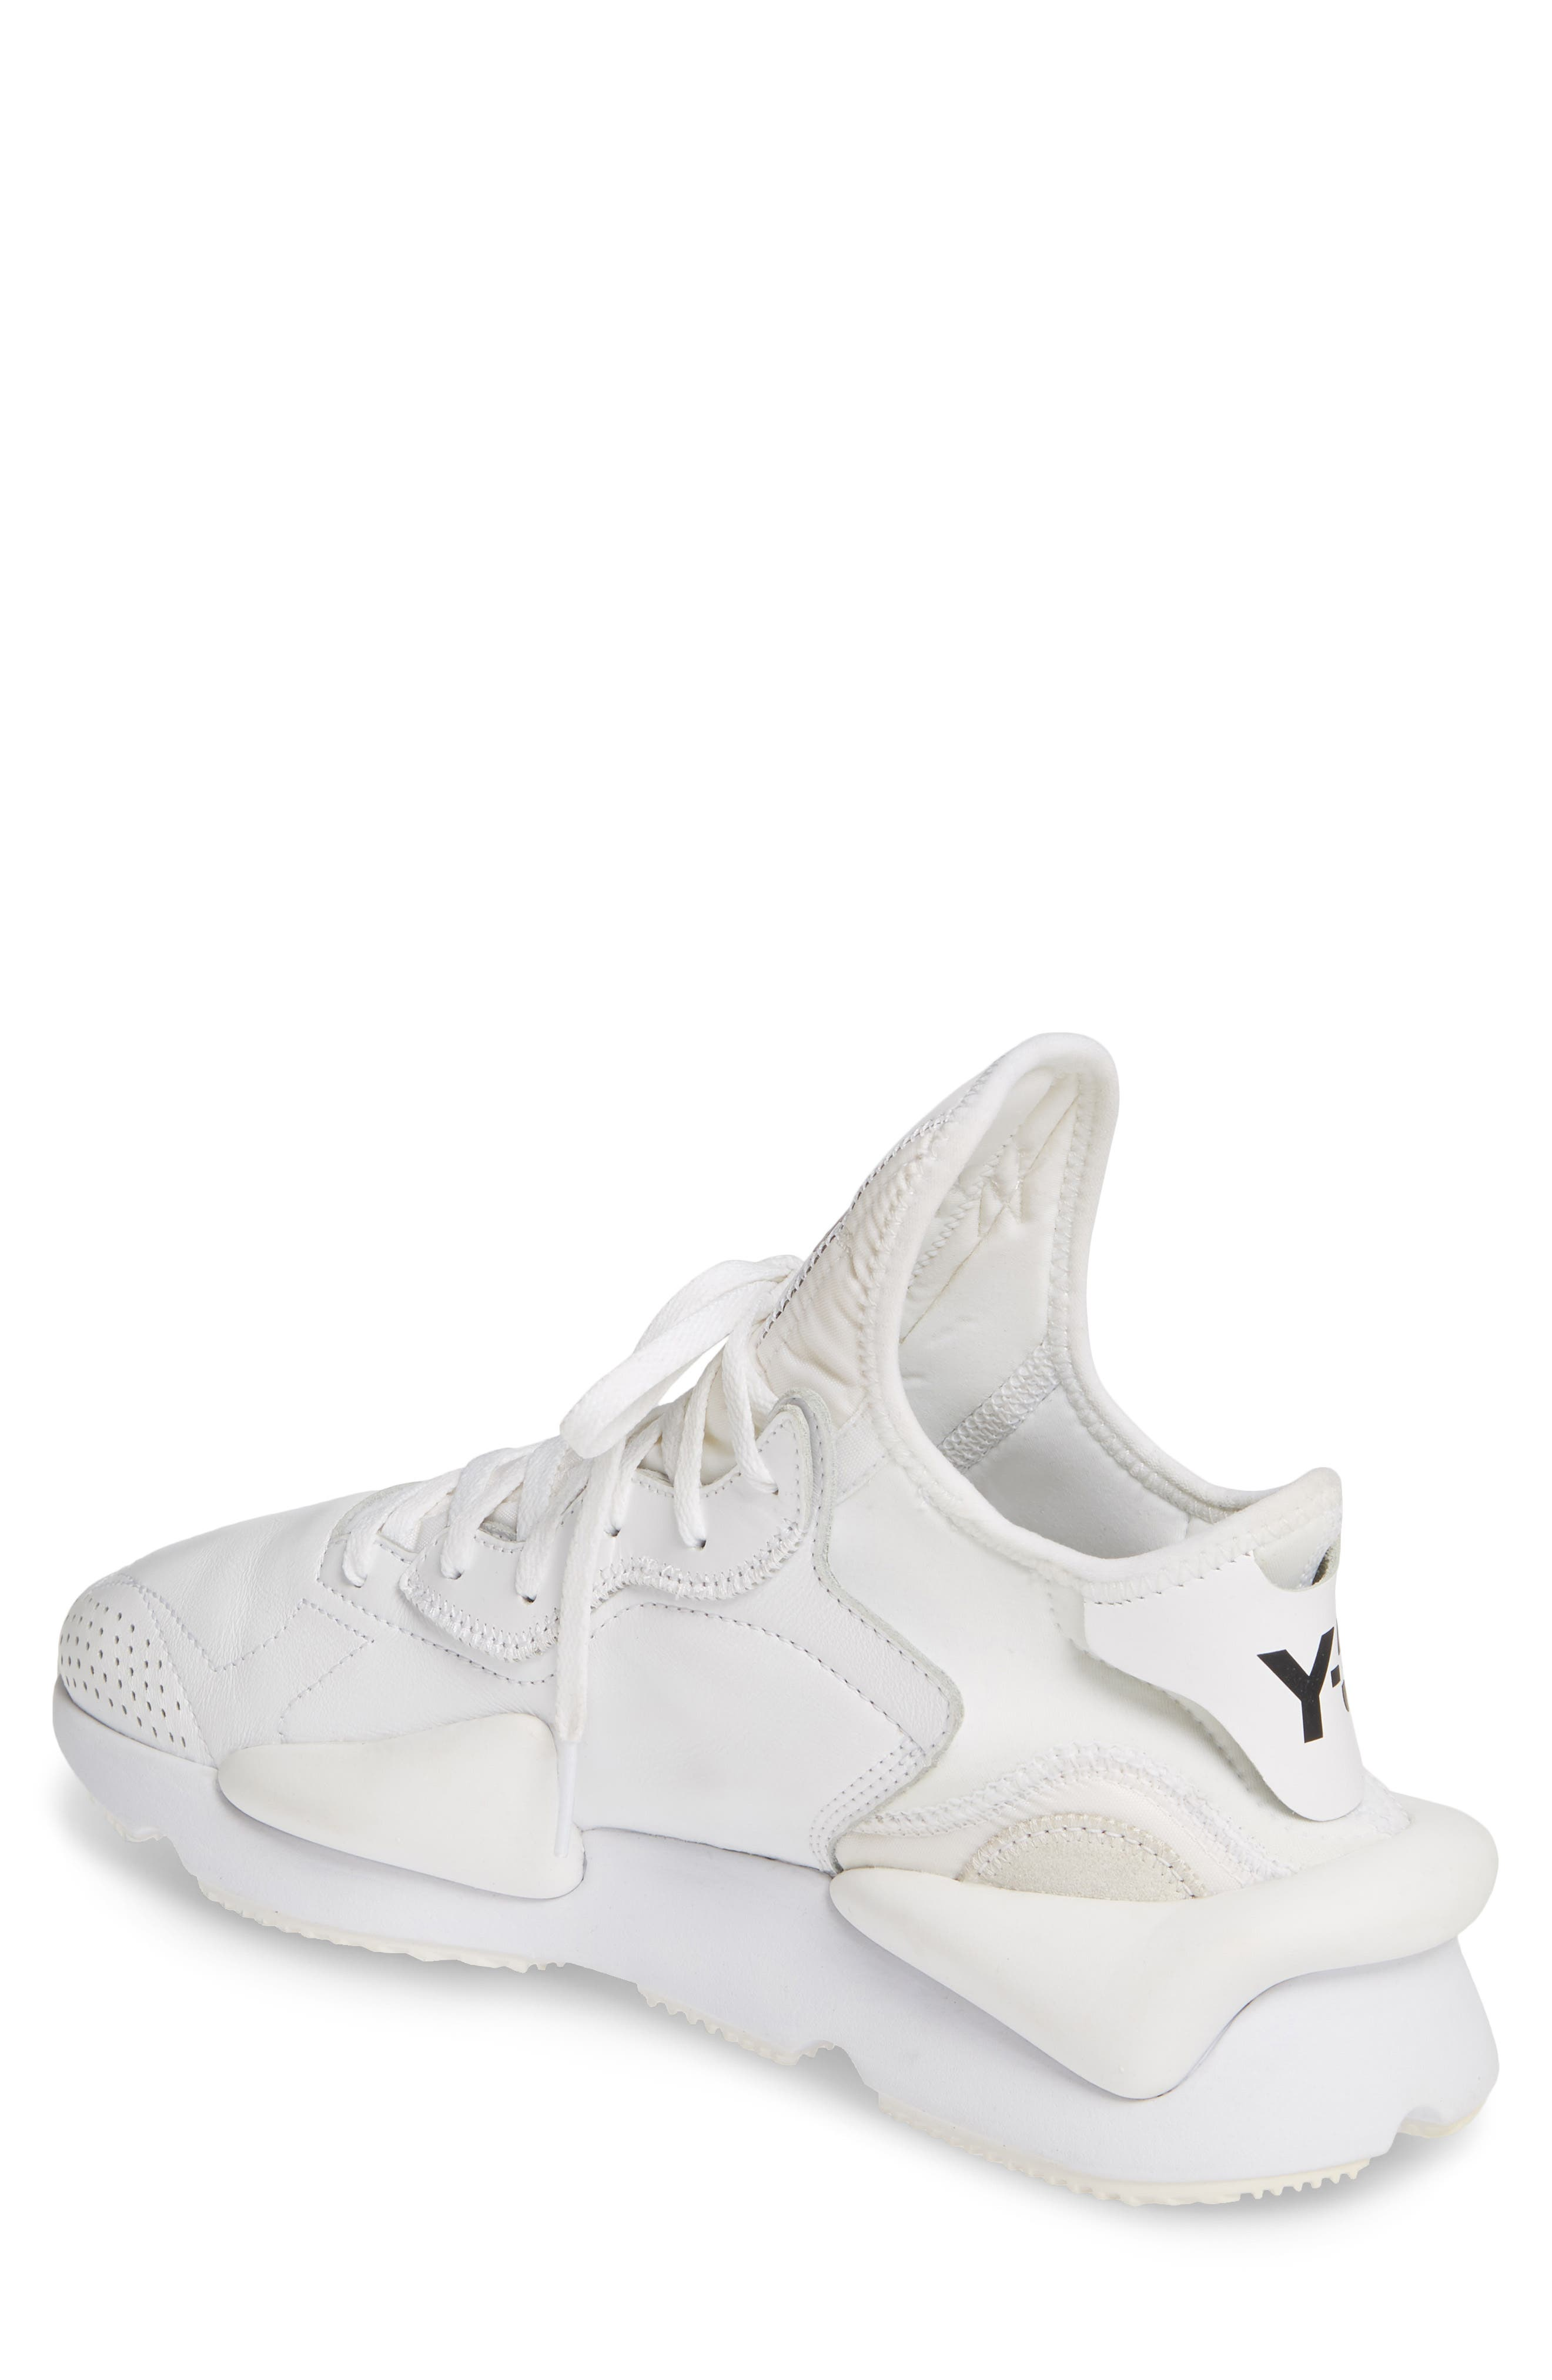 cbeba1fae68f1 Men s Y-3 Shoes